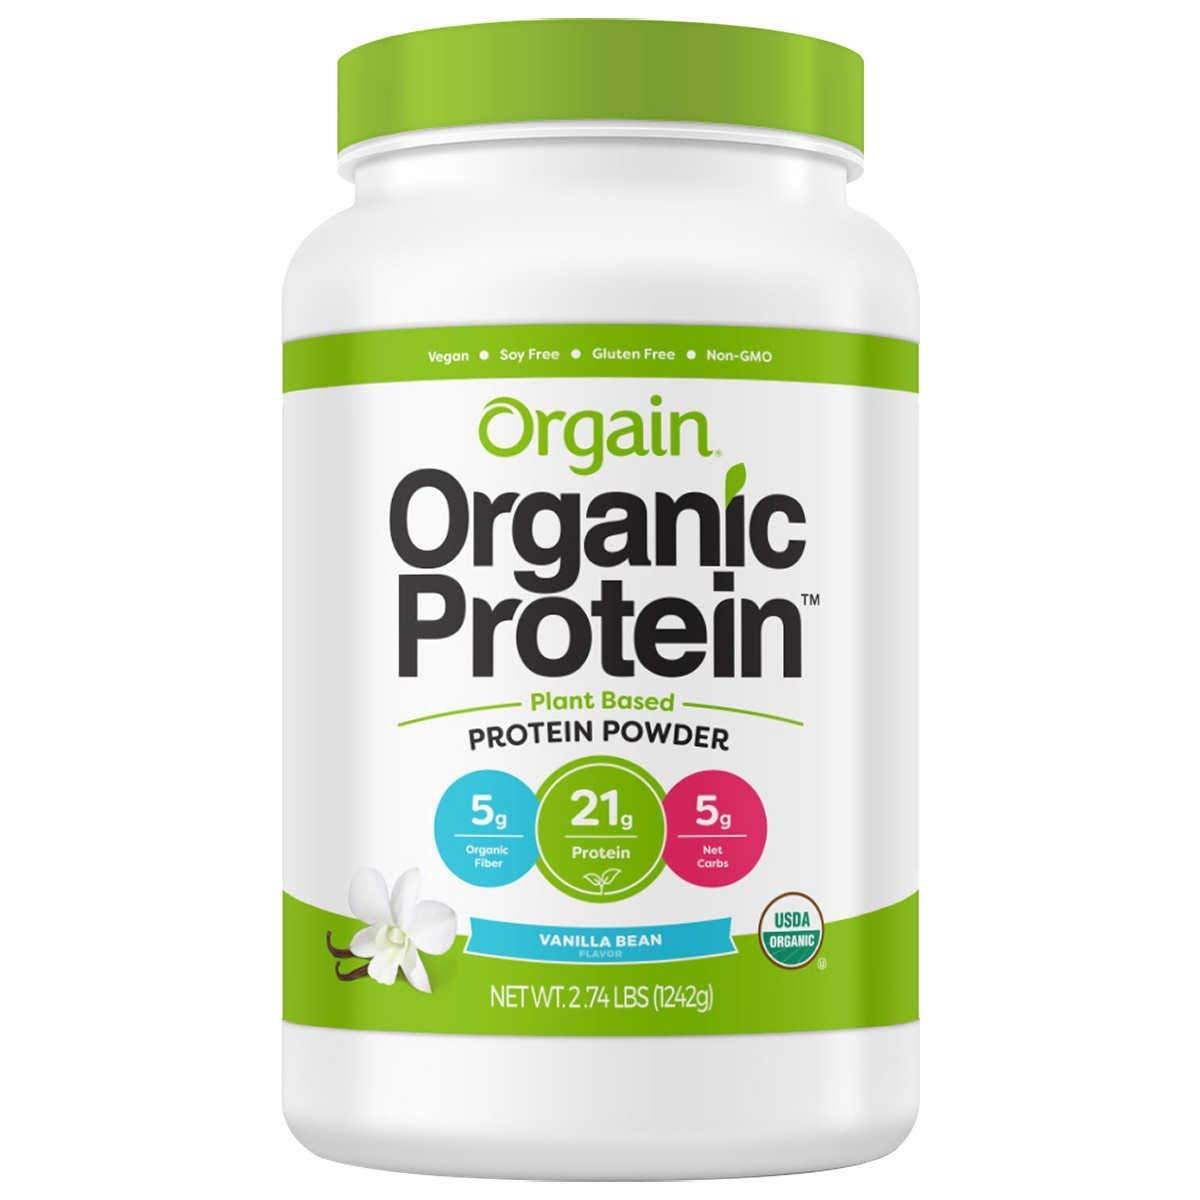 Orgain Organic Plant Based Protein Powder, Vegan, Non-GMO, Gluten Free, 1 Count, Packaging May Vary (Vanilla Bean, 2.74 Pound)